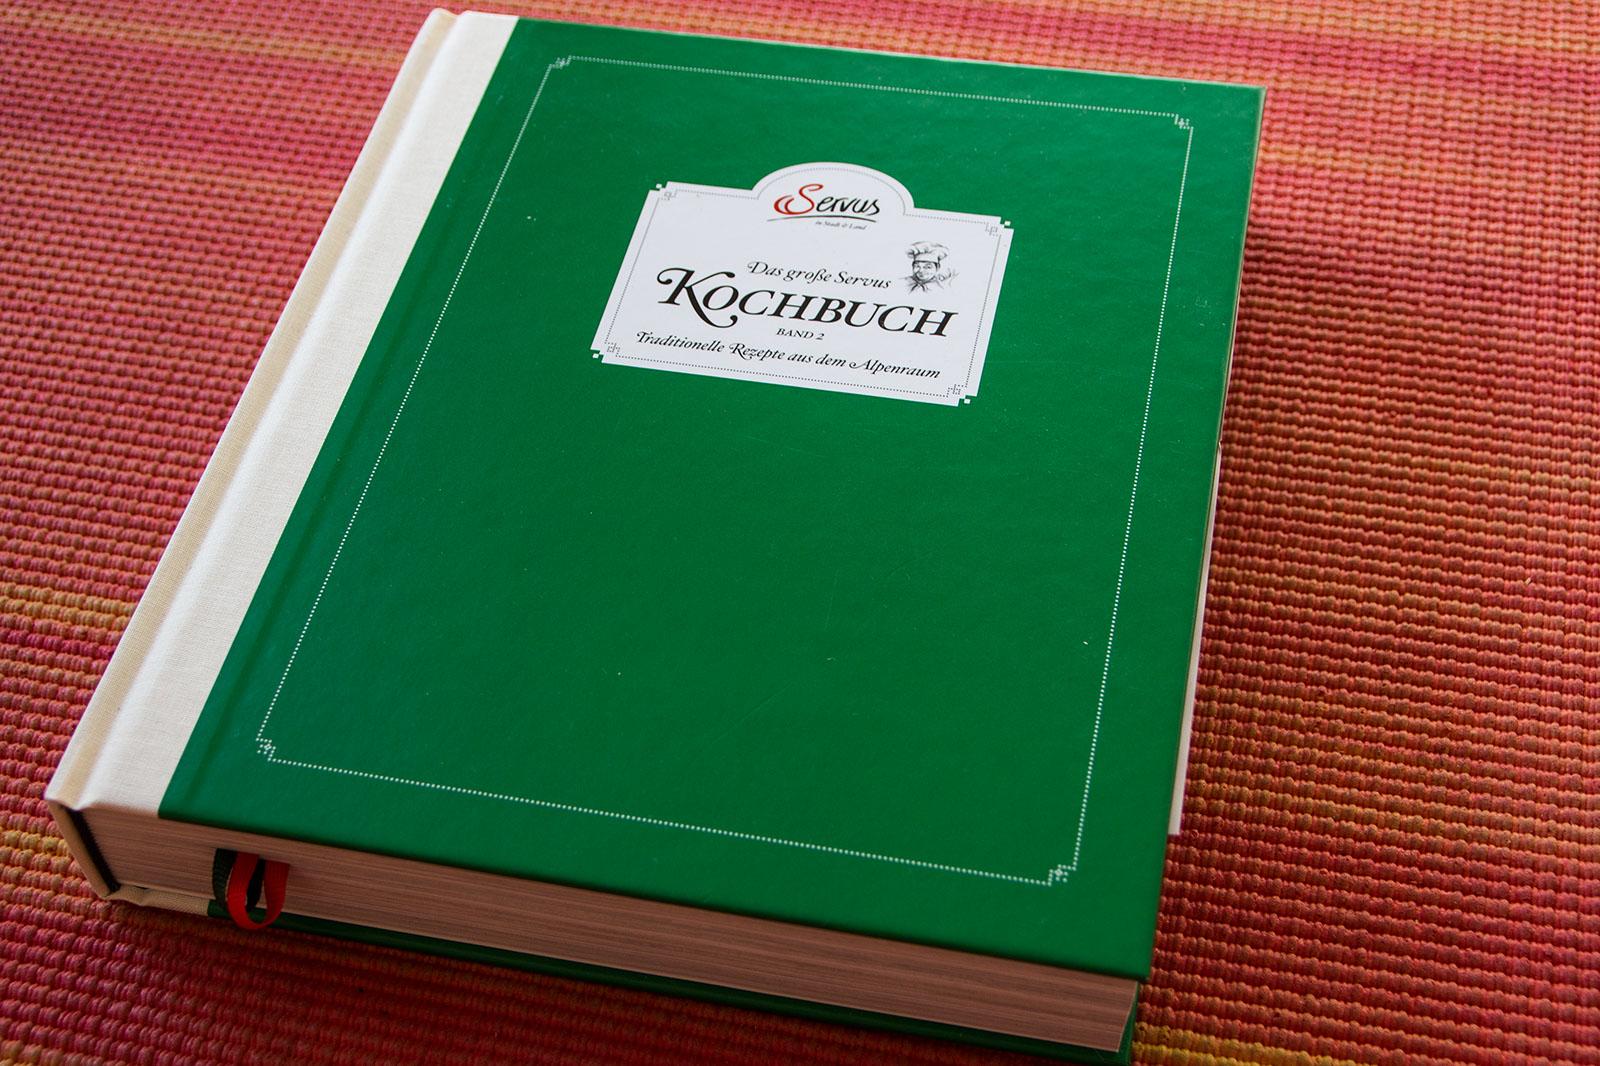 "Das grüne, dicke Kochbuch: ""Das große Servus Kochbuch - Band 2"""